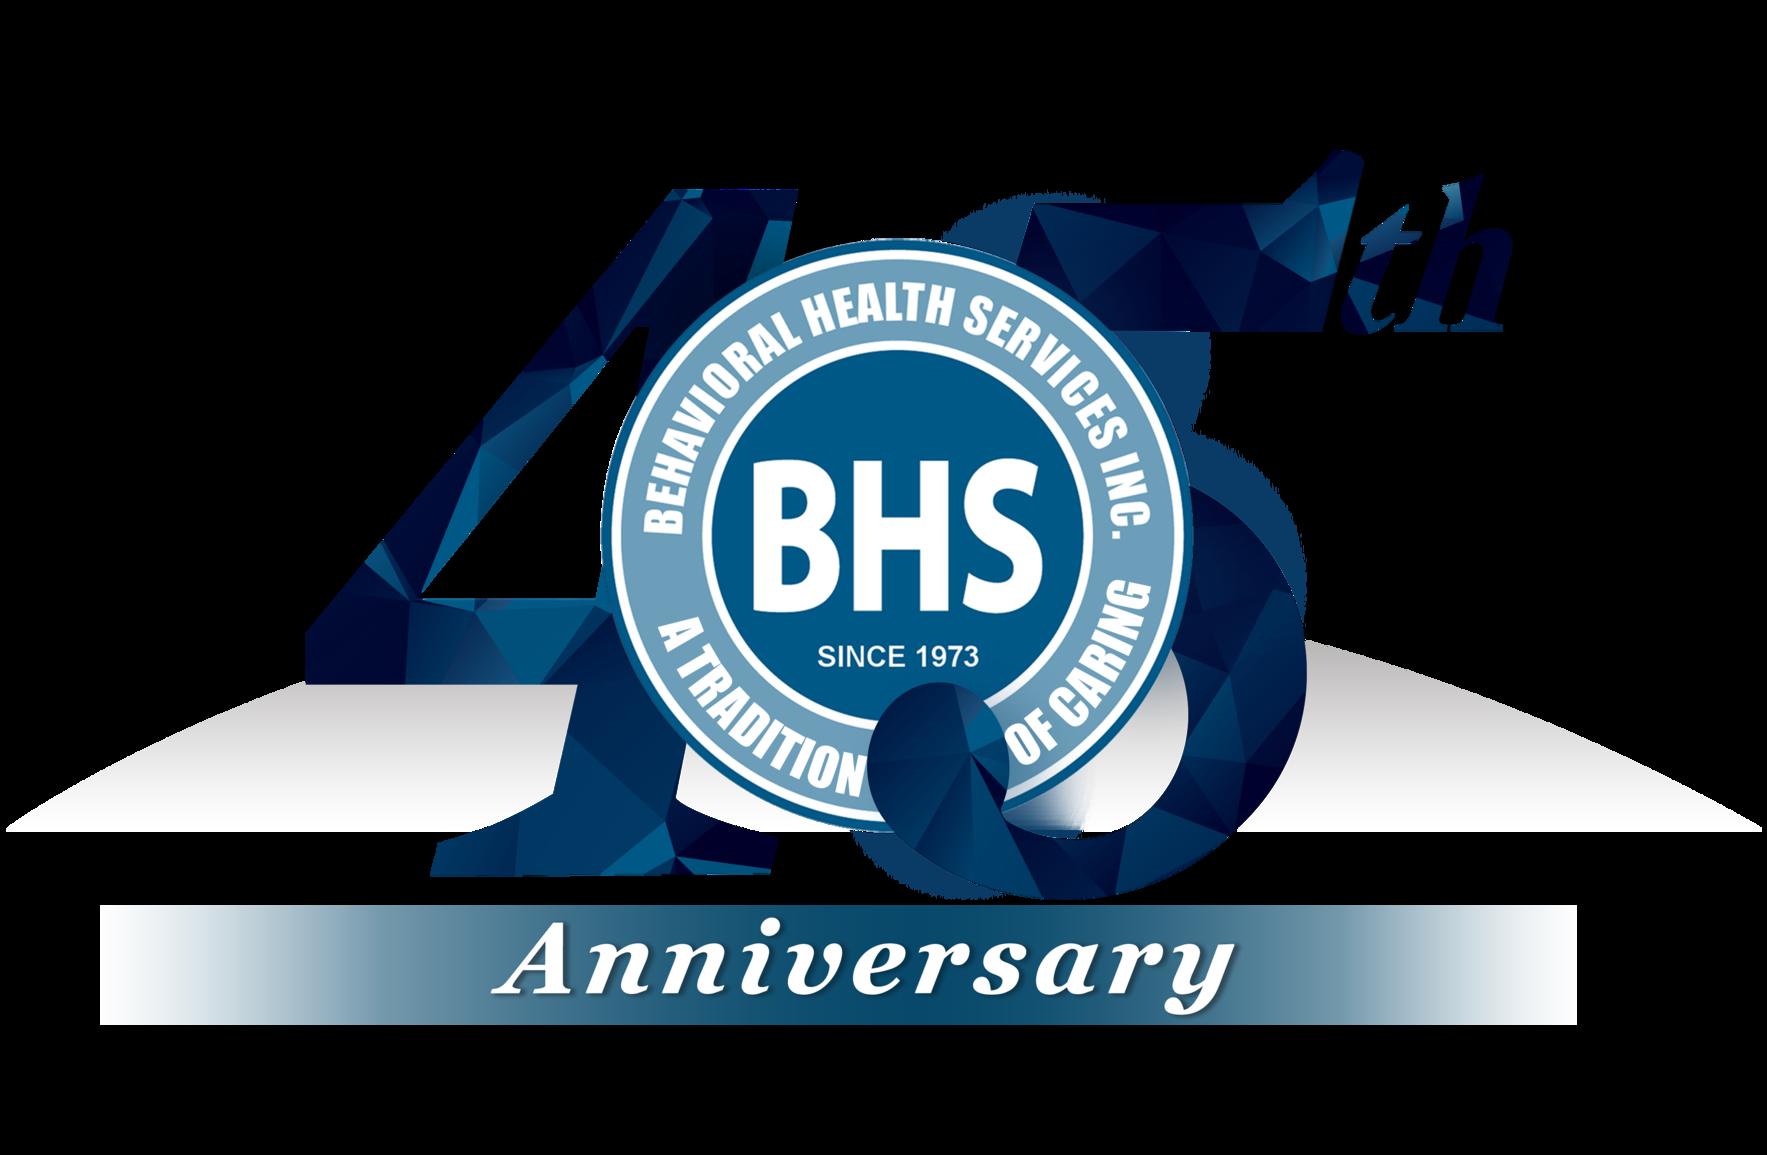 BHS 45th Anniversary Gala image